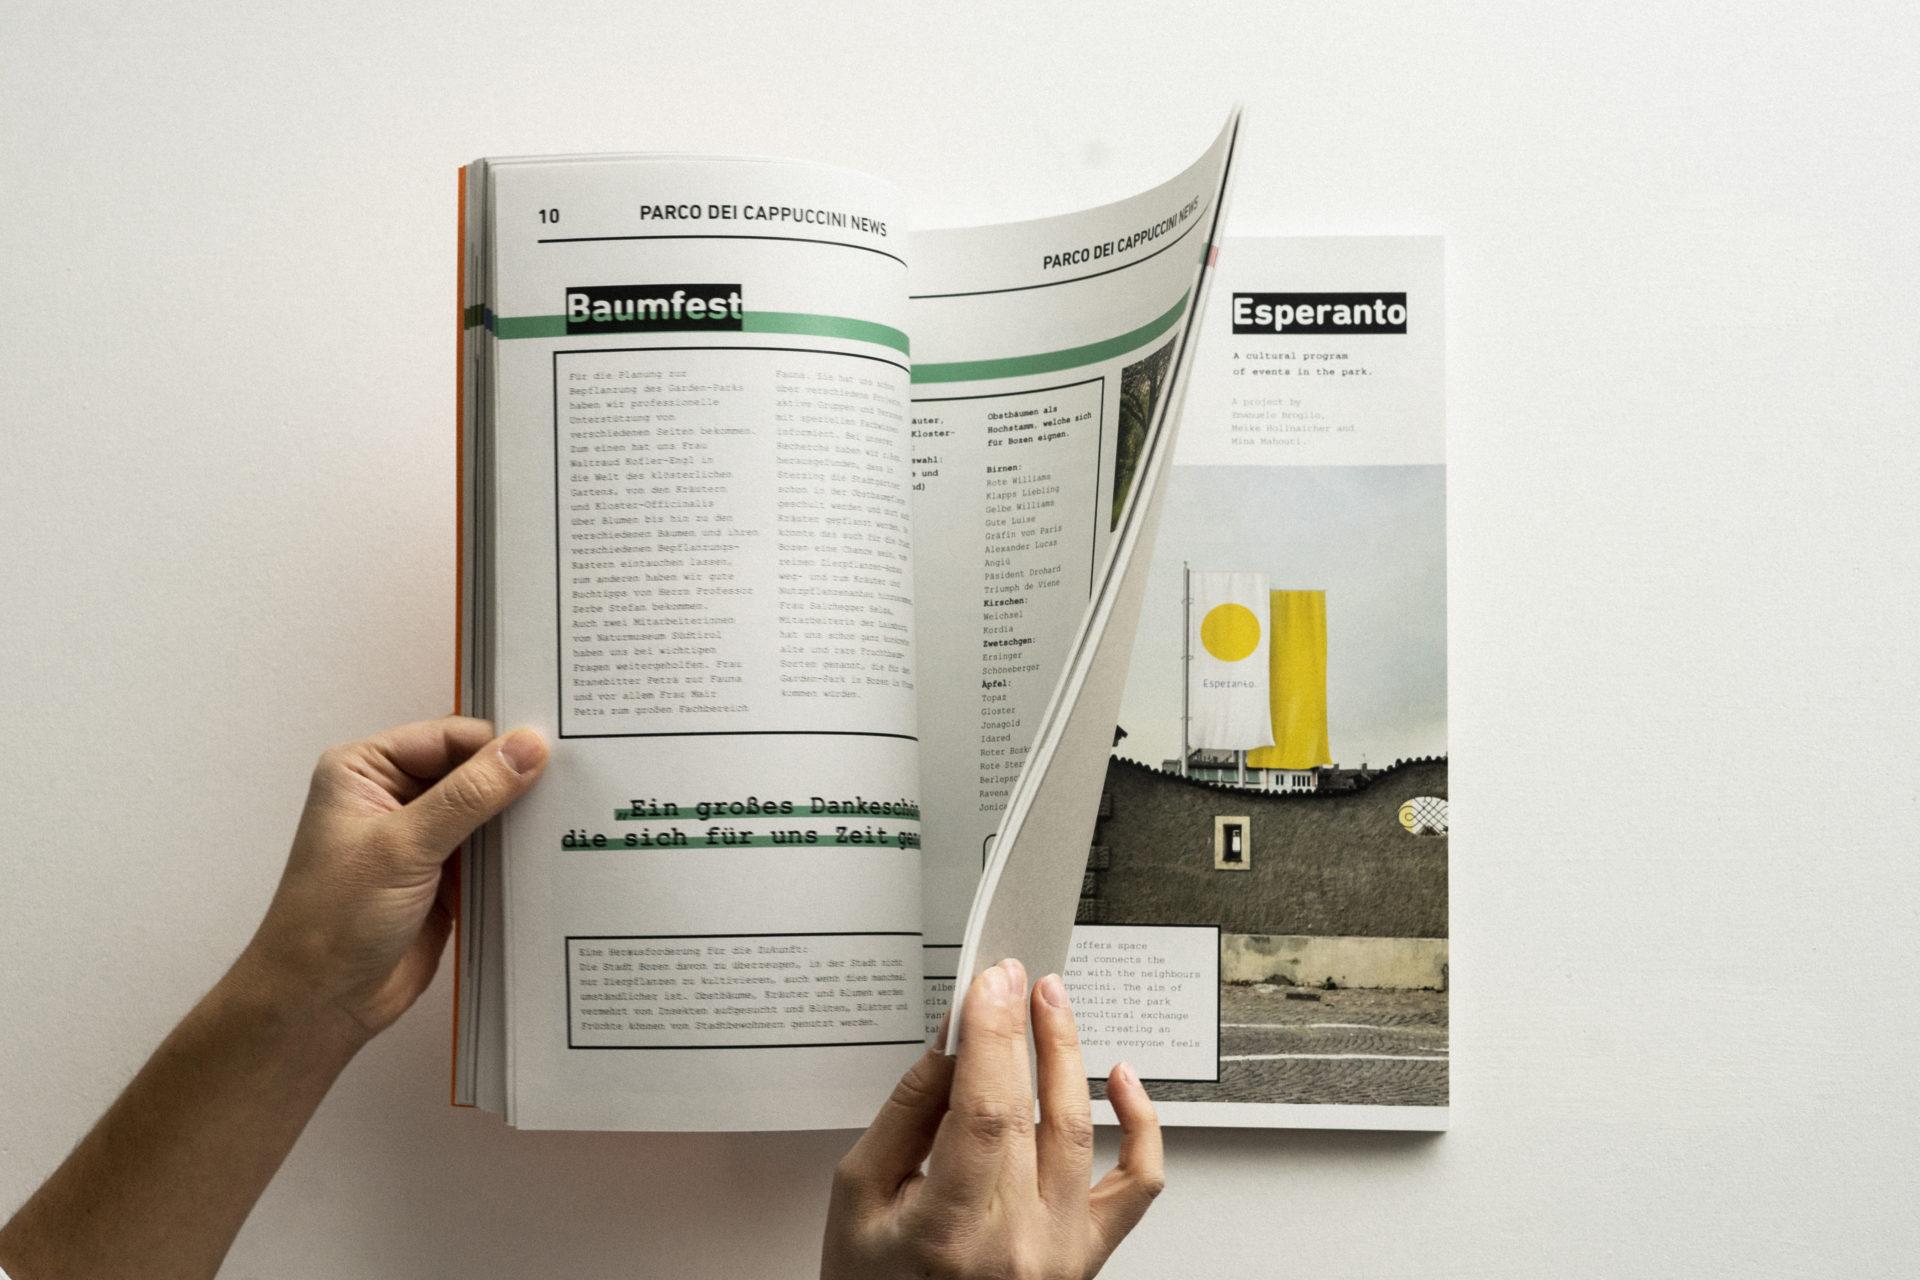 Es lebe der Park / Vivere il Parco Dokumenation Grüne Oase und Esperanto